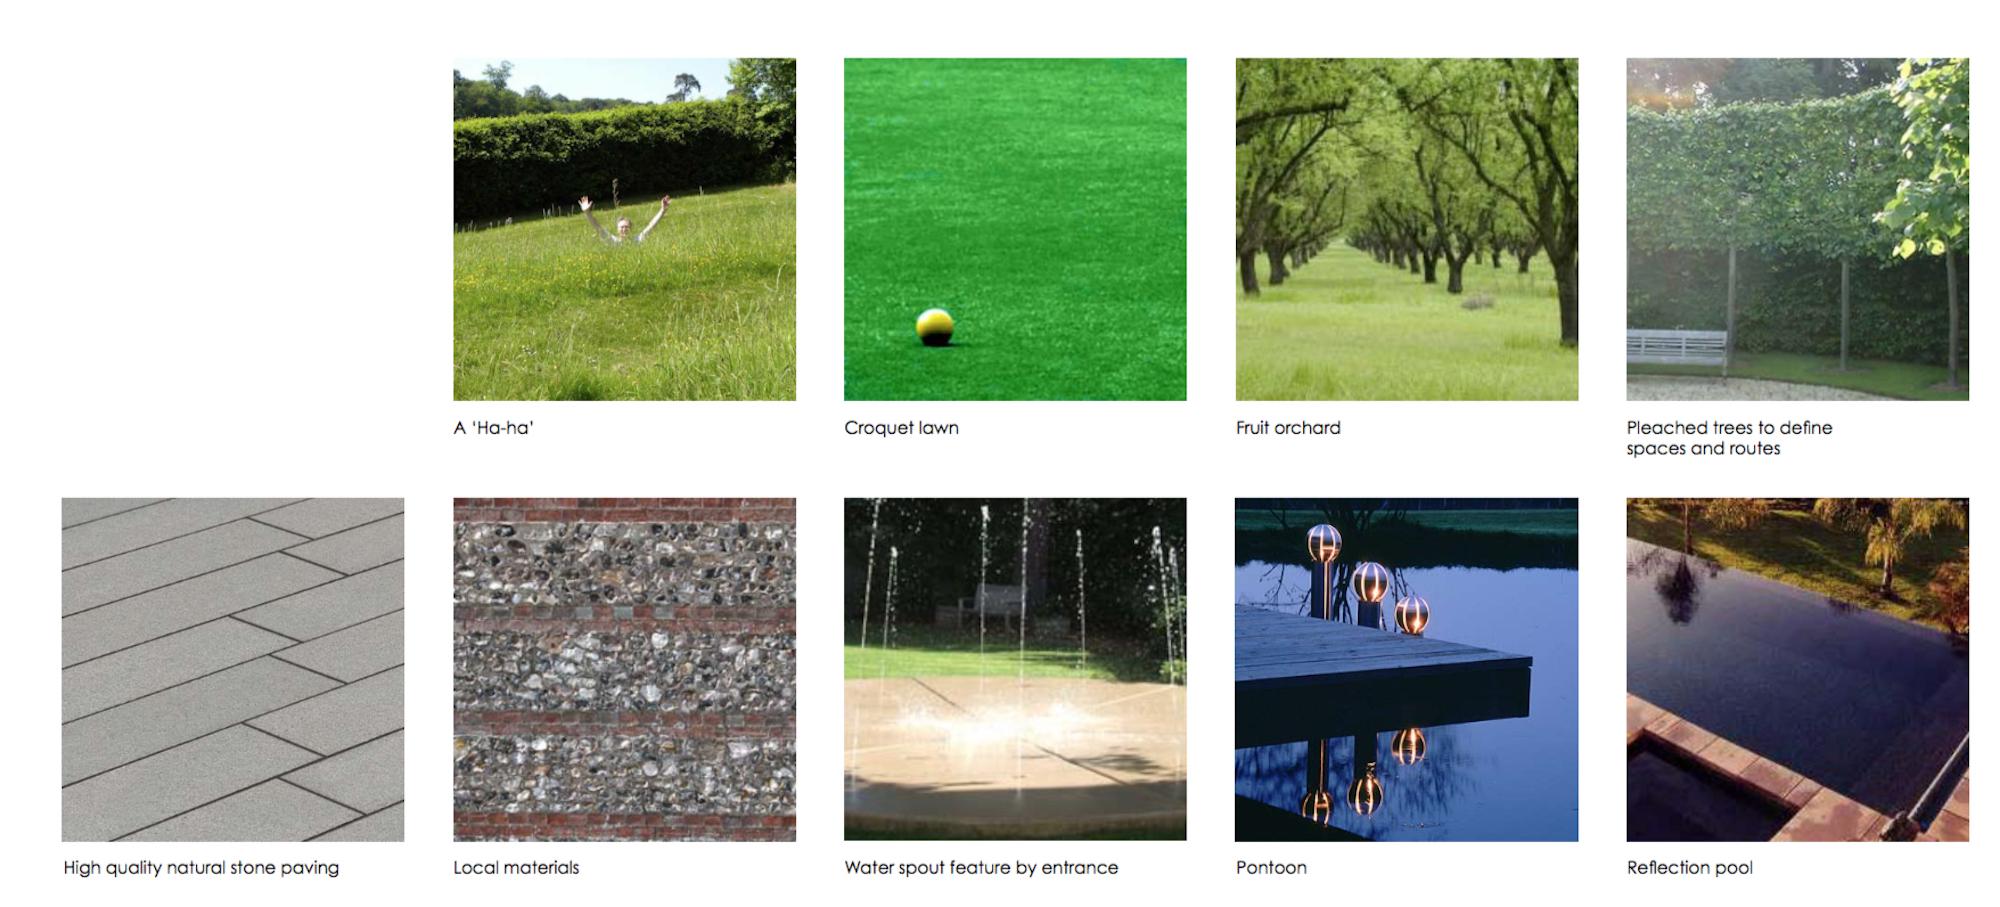 Woodcote Farm landscape design 02.jpg